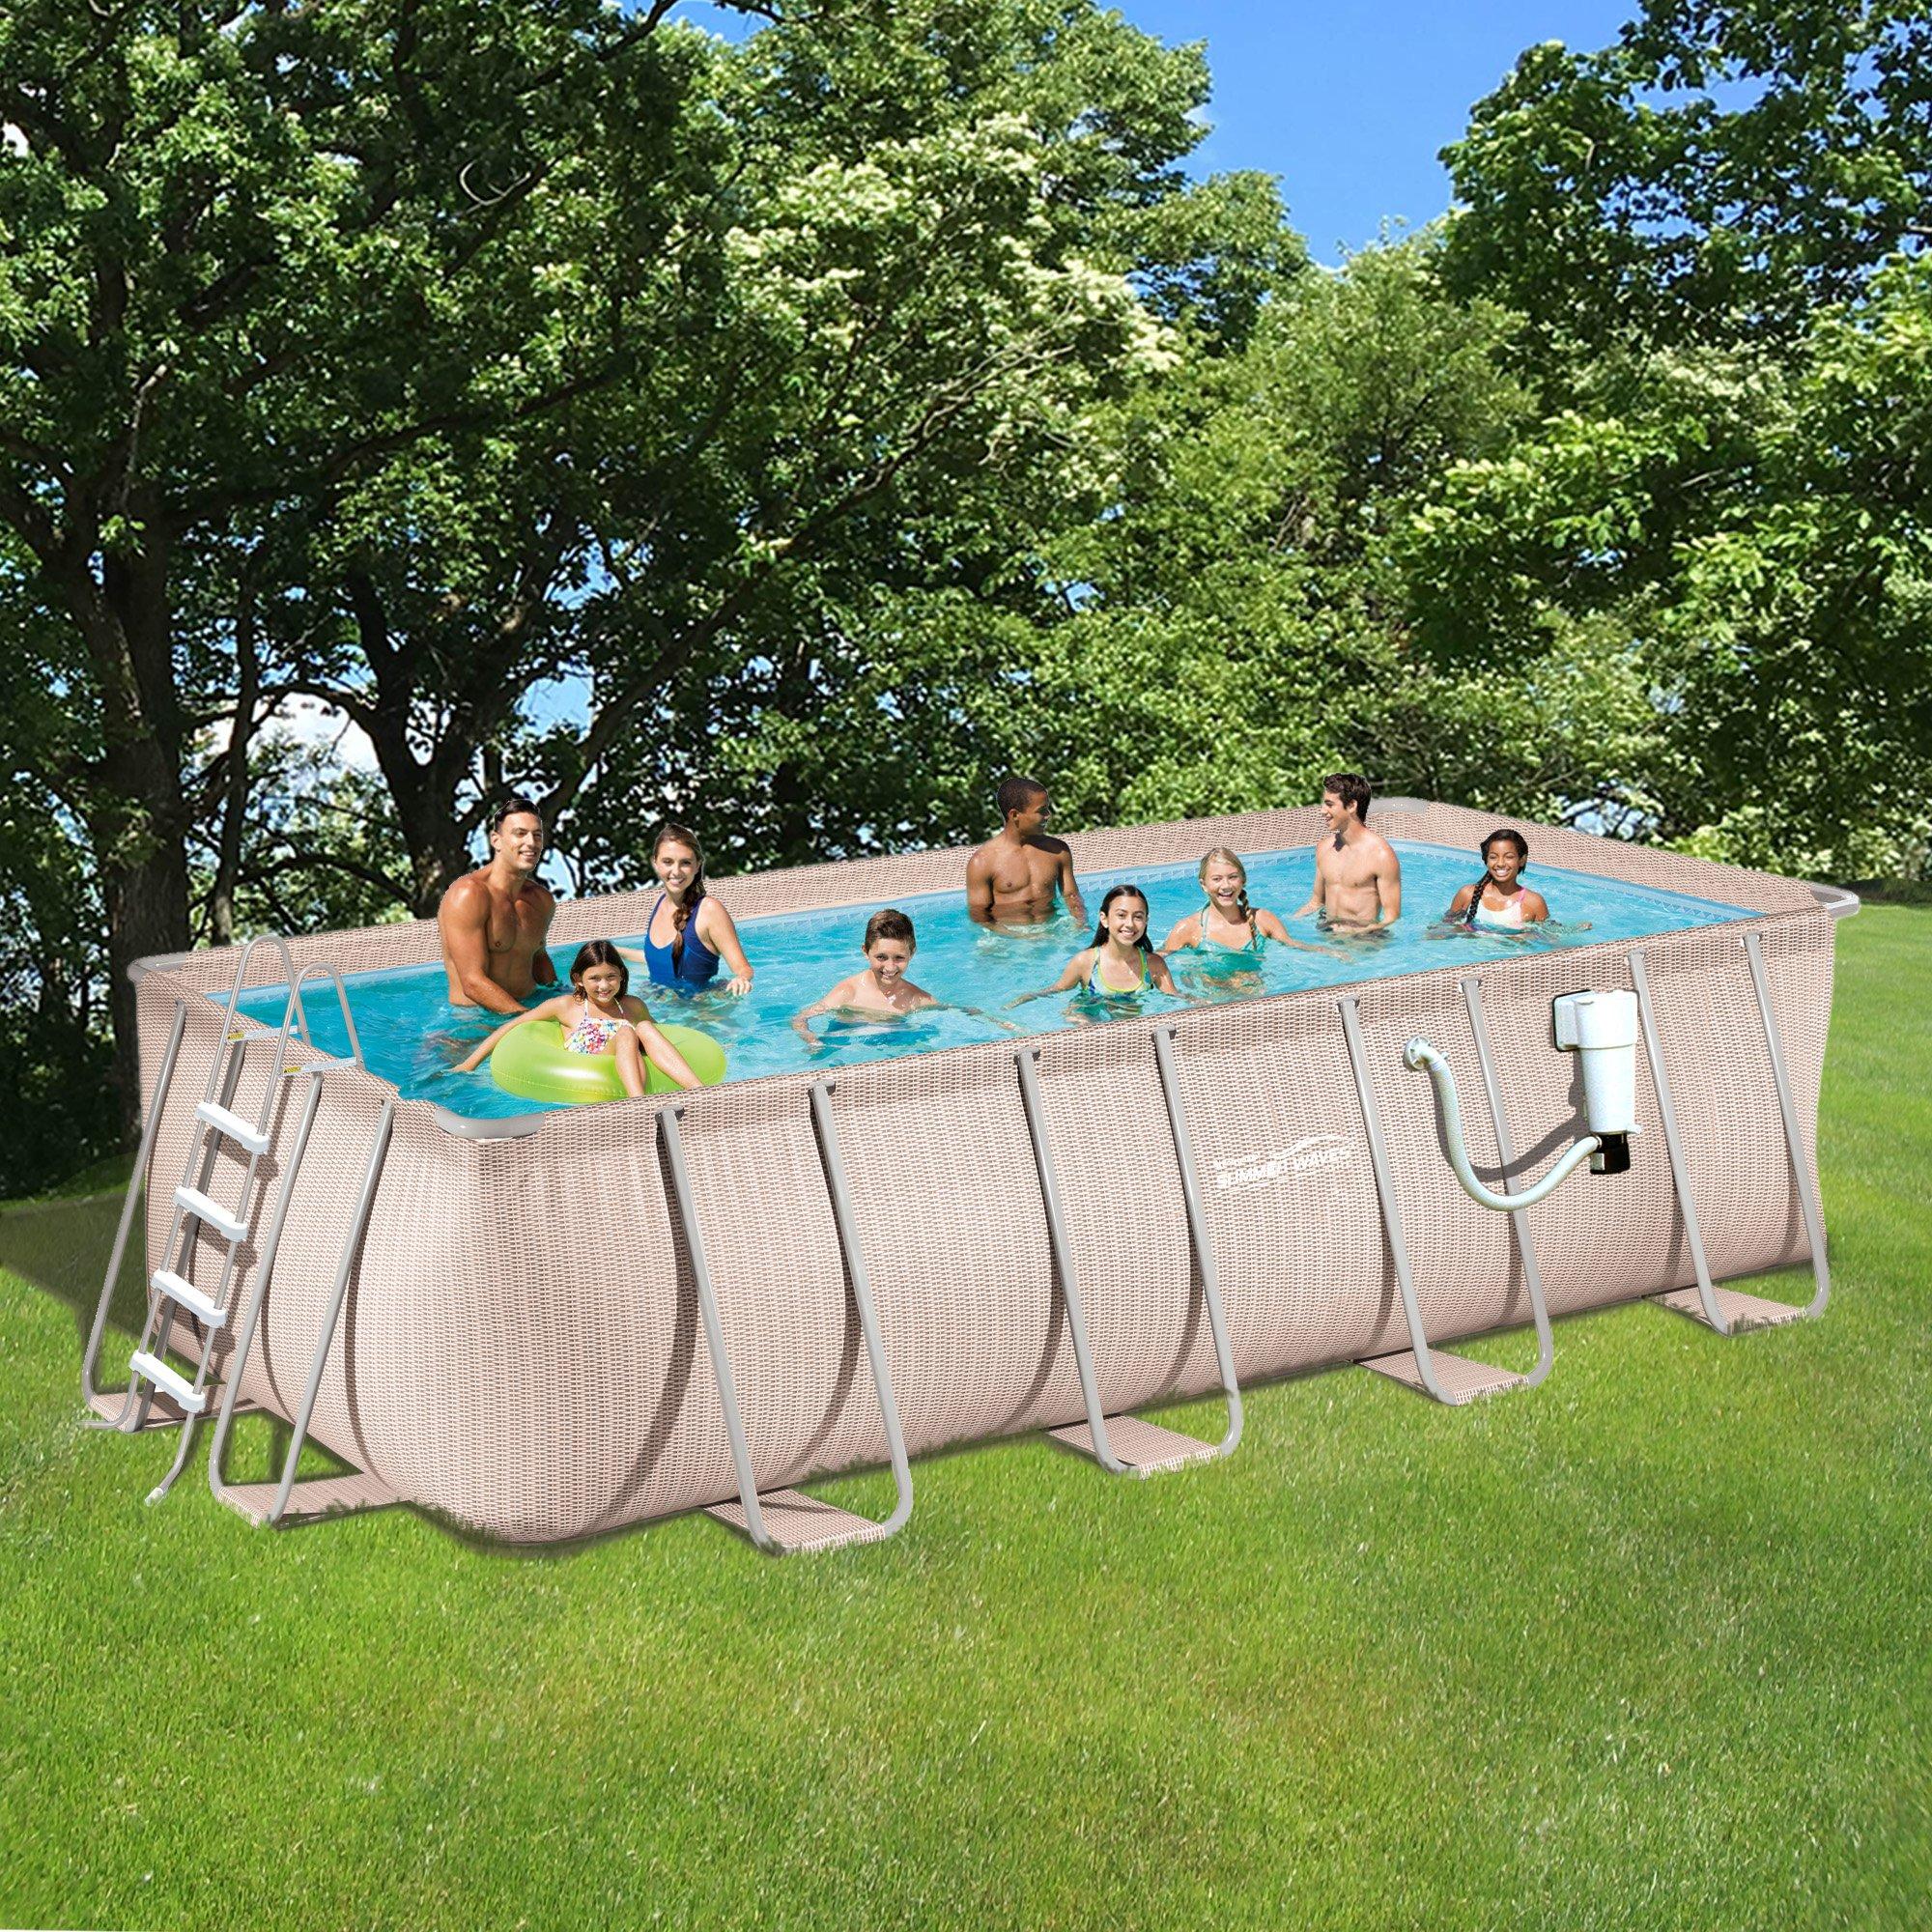 Light Wicker Pool Package 9'x18' Rect Metal Frame 52'' Deep | Summer Waves NB2233